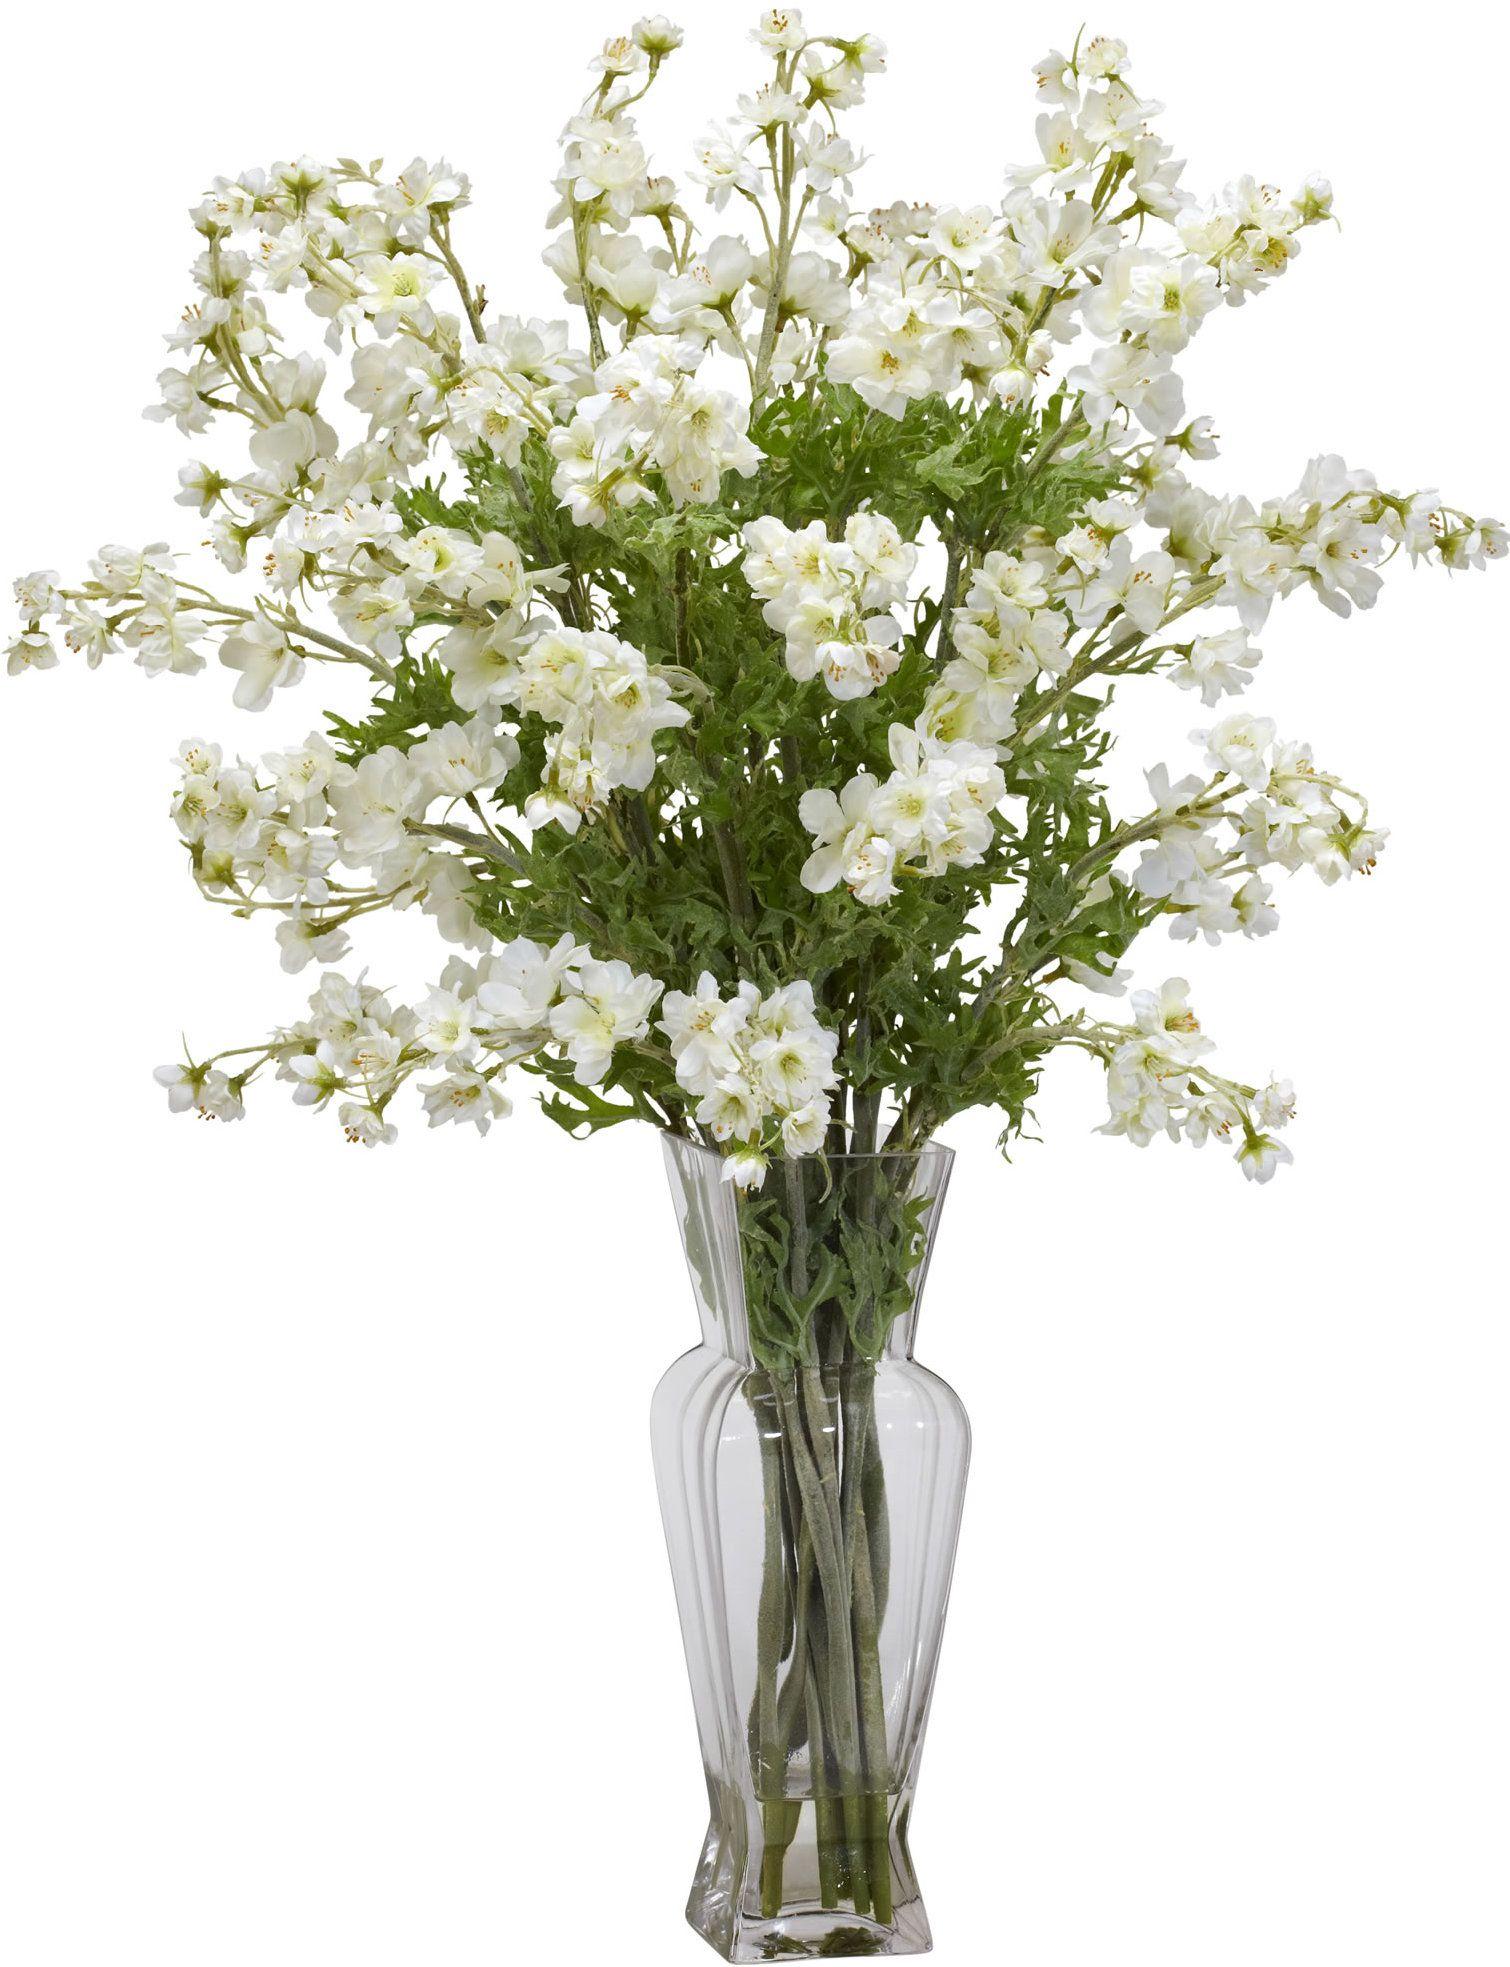 Faux daisy flower arrangement with planter flower arrangements faux daisy flower arrangement with planter izmirmasajfo